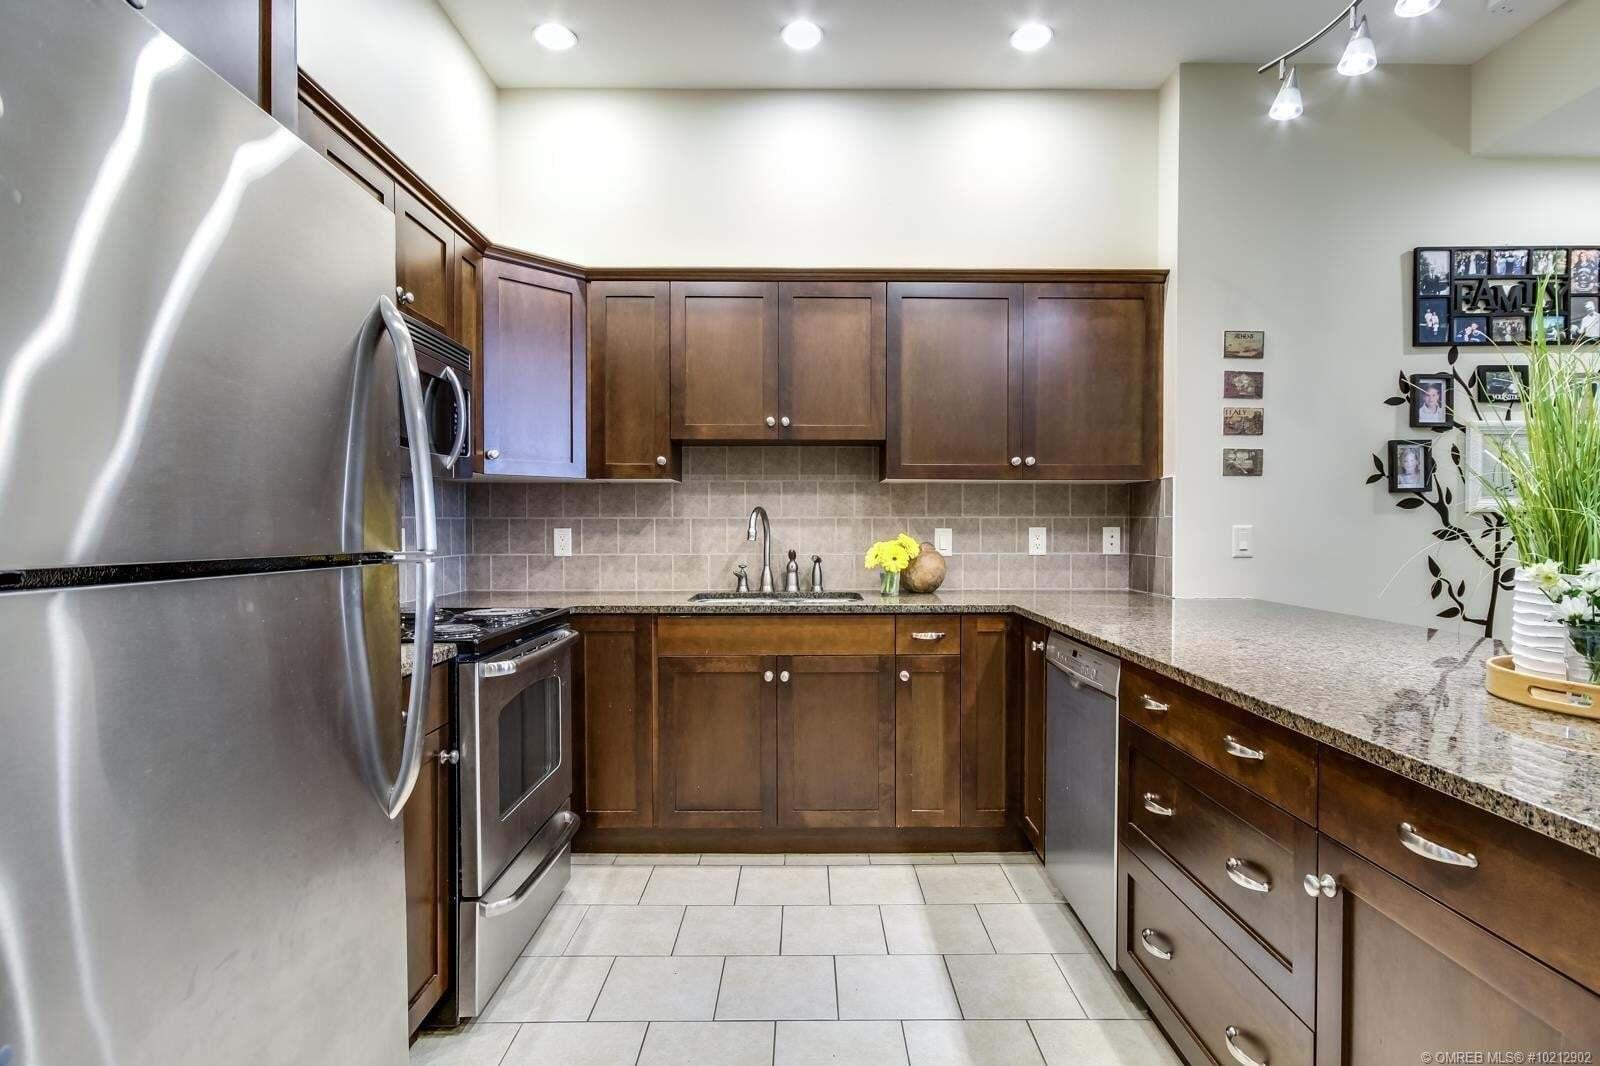 Condo for sale at 3843 Brown Rd West Kelowna British Columbia - MLS: 10212902